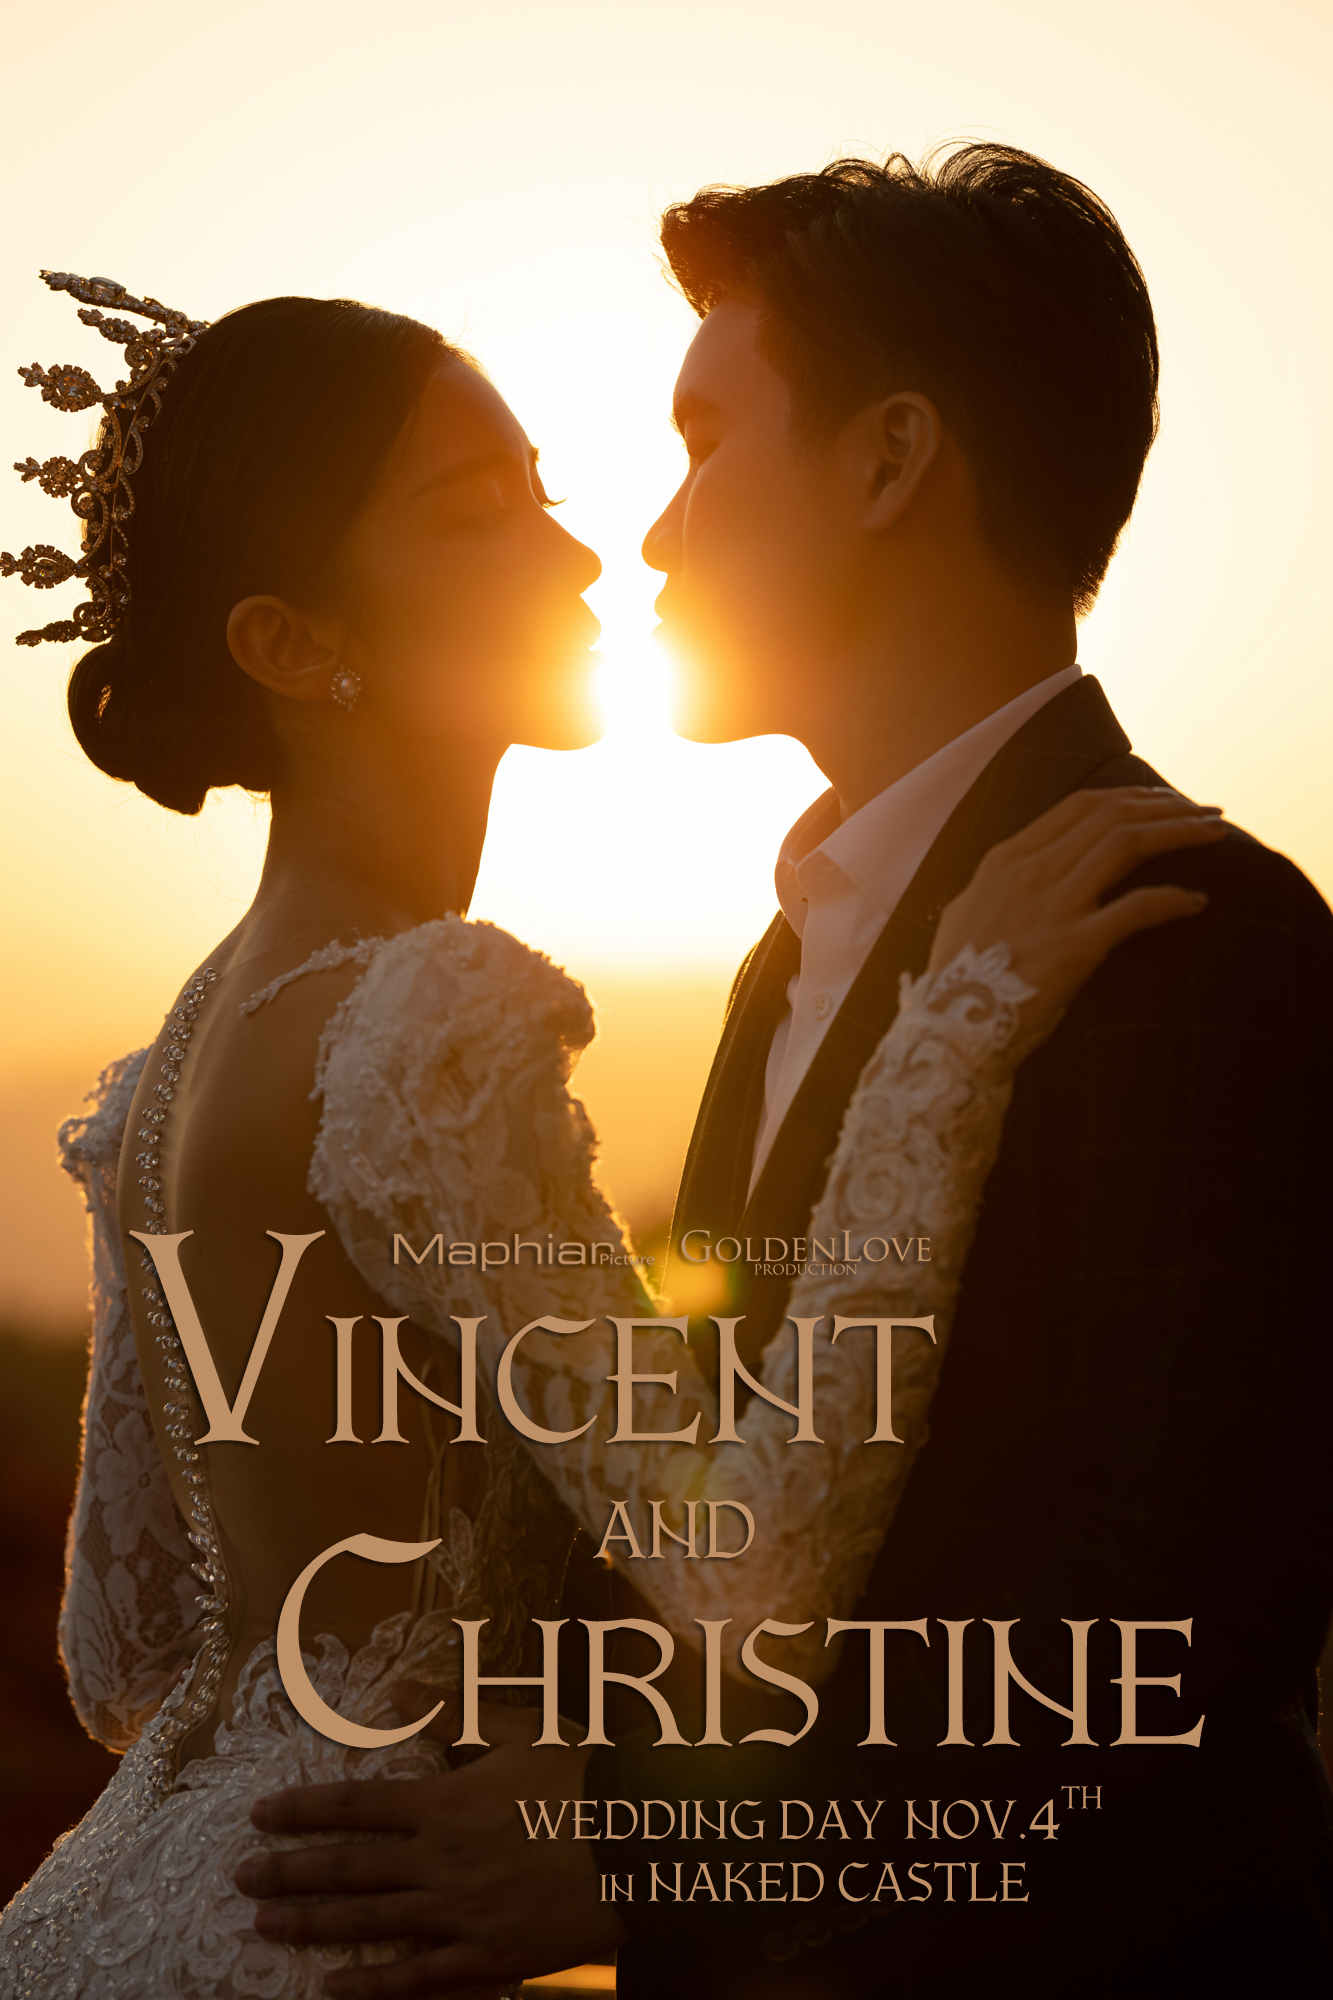 VINCENT & CHRISTINE · 裸心堡婚礼